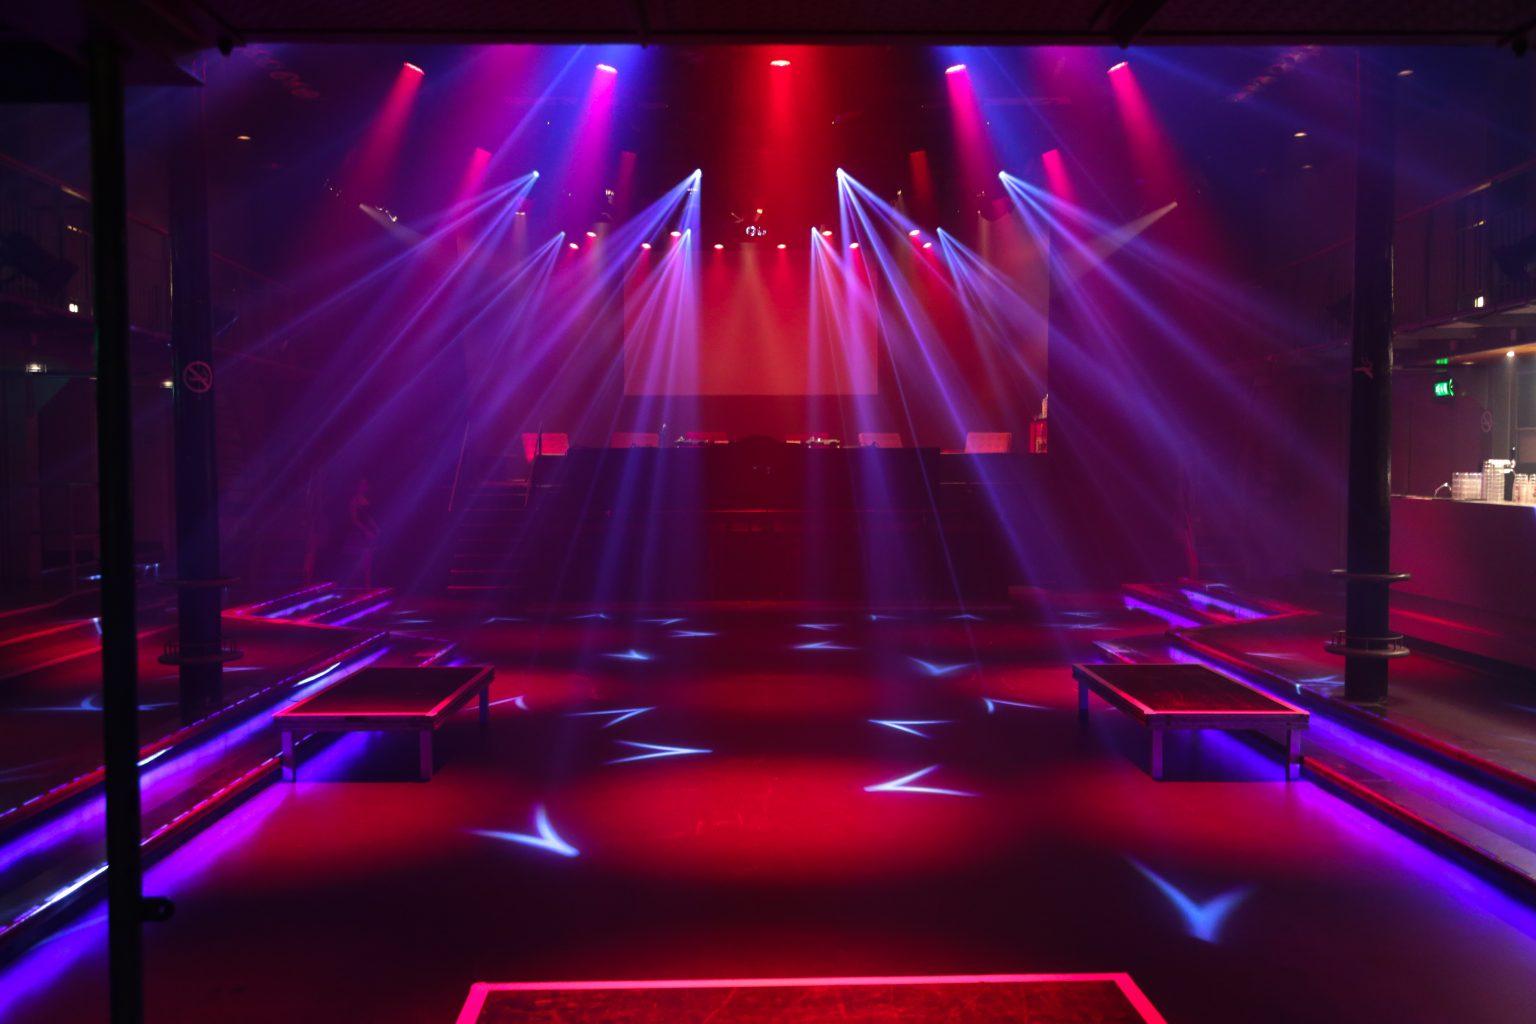 Melkweg Max lights and visuals